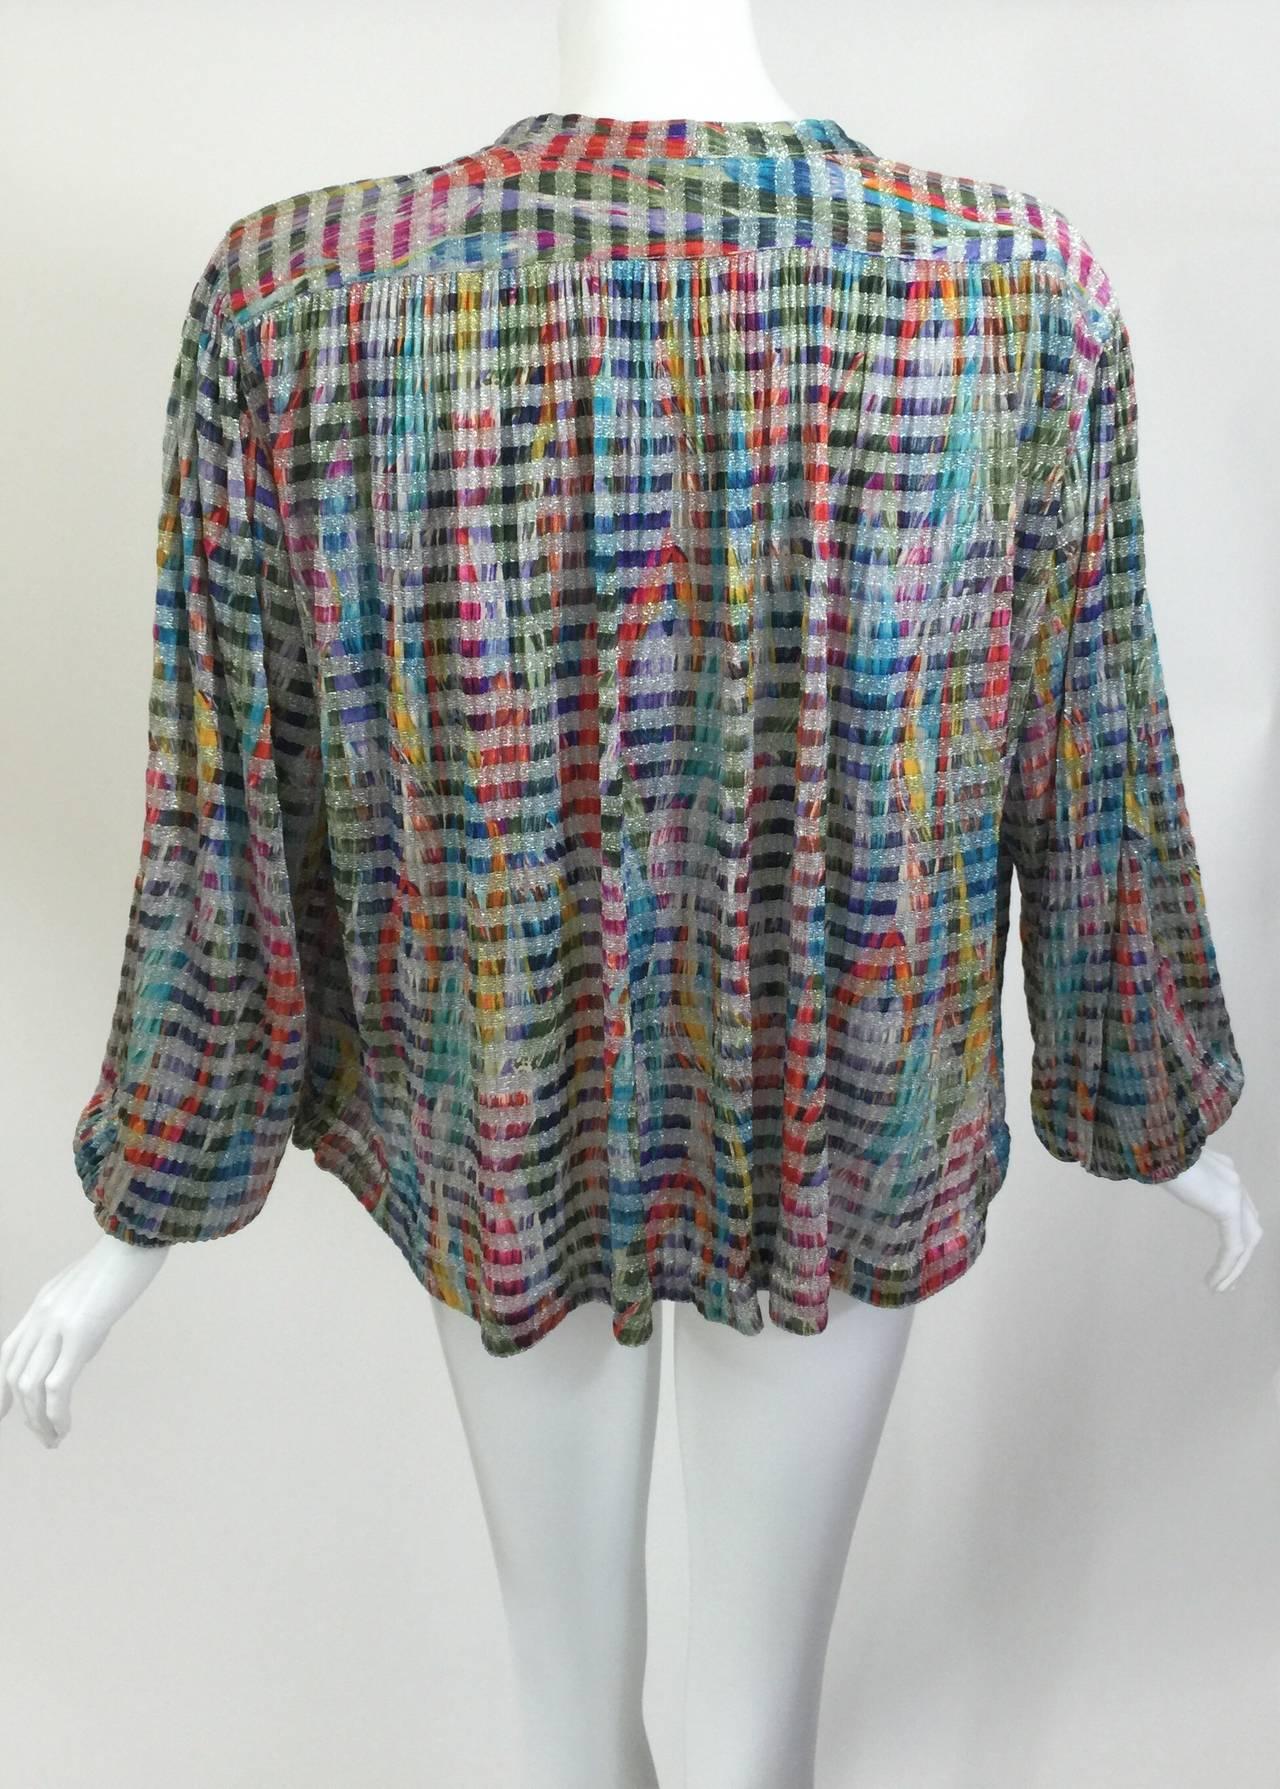 A gorgeous multi - color metallic knit cardigan.